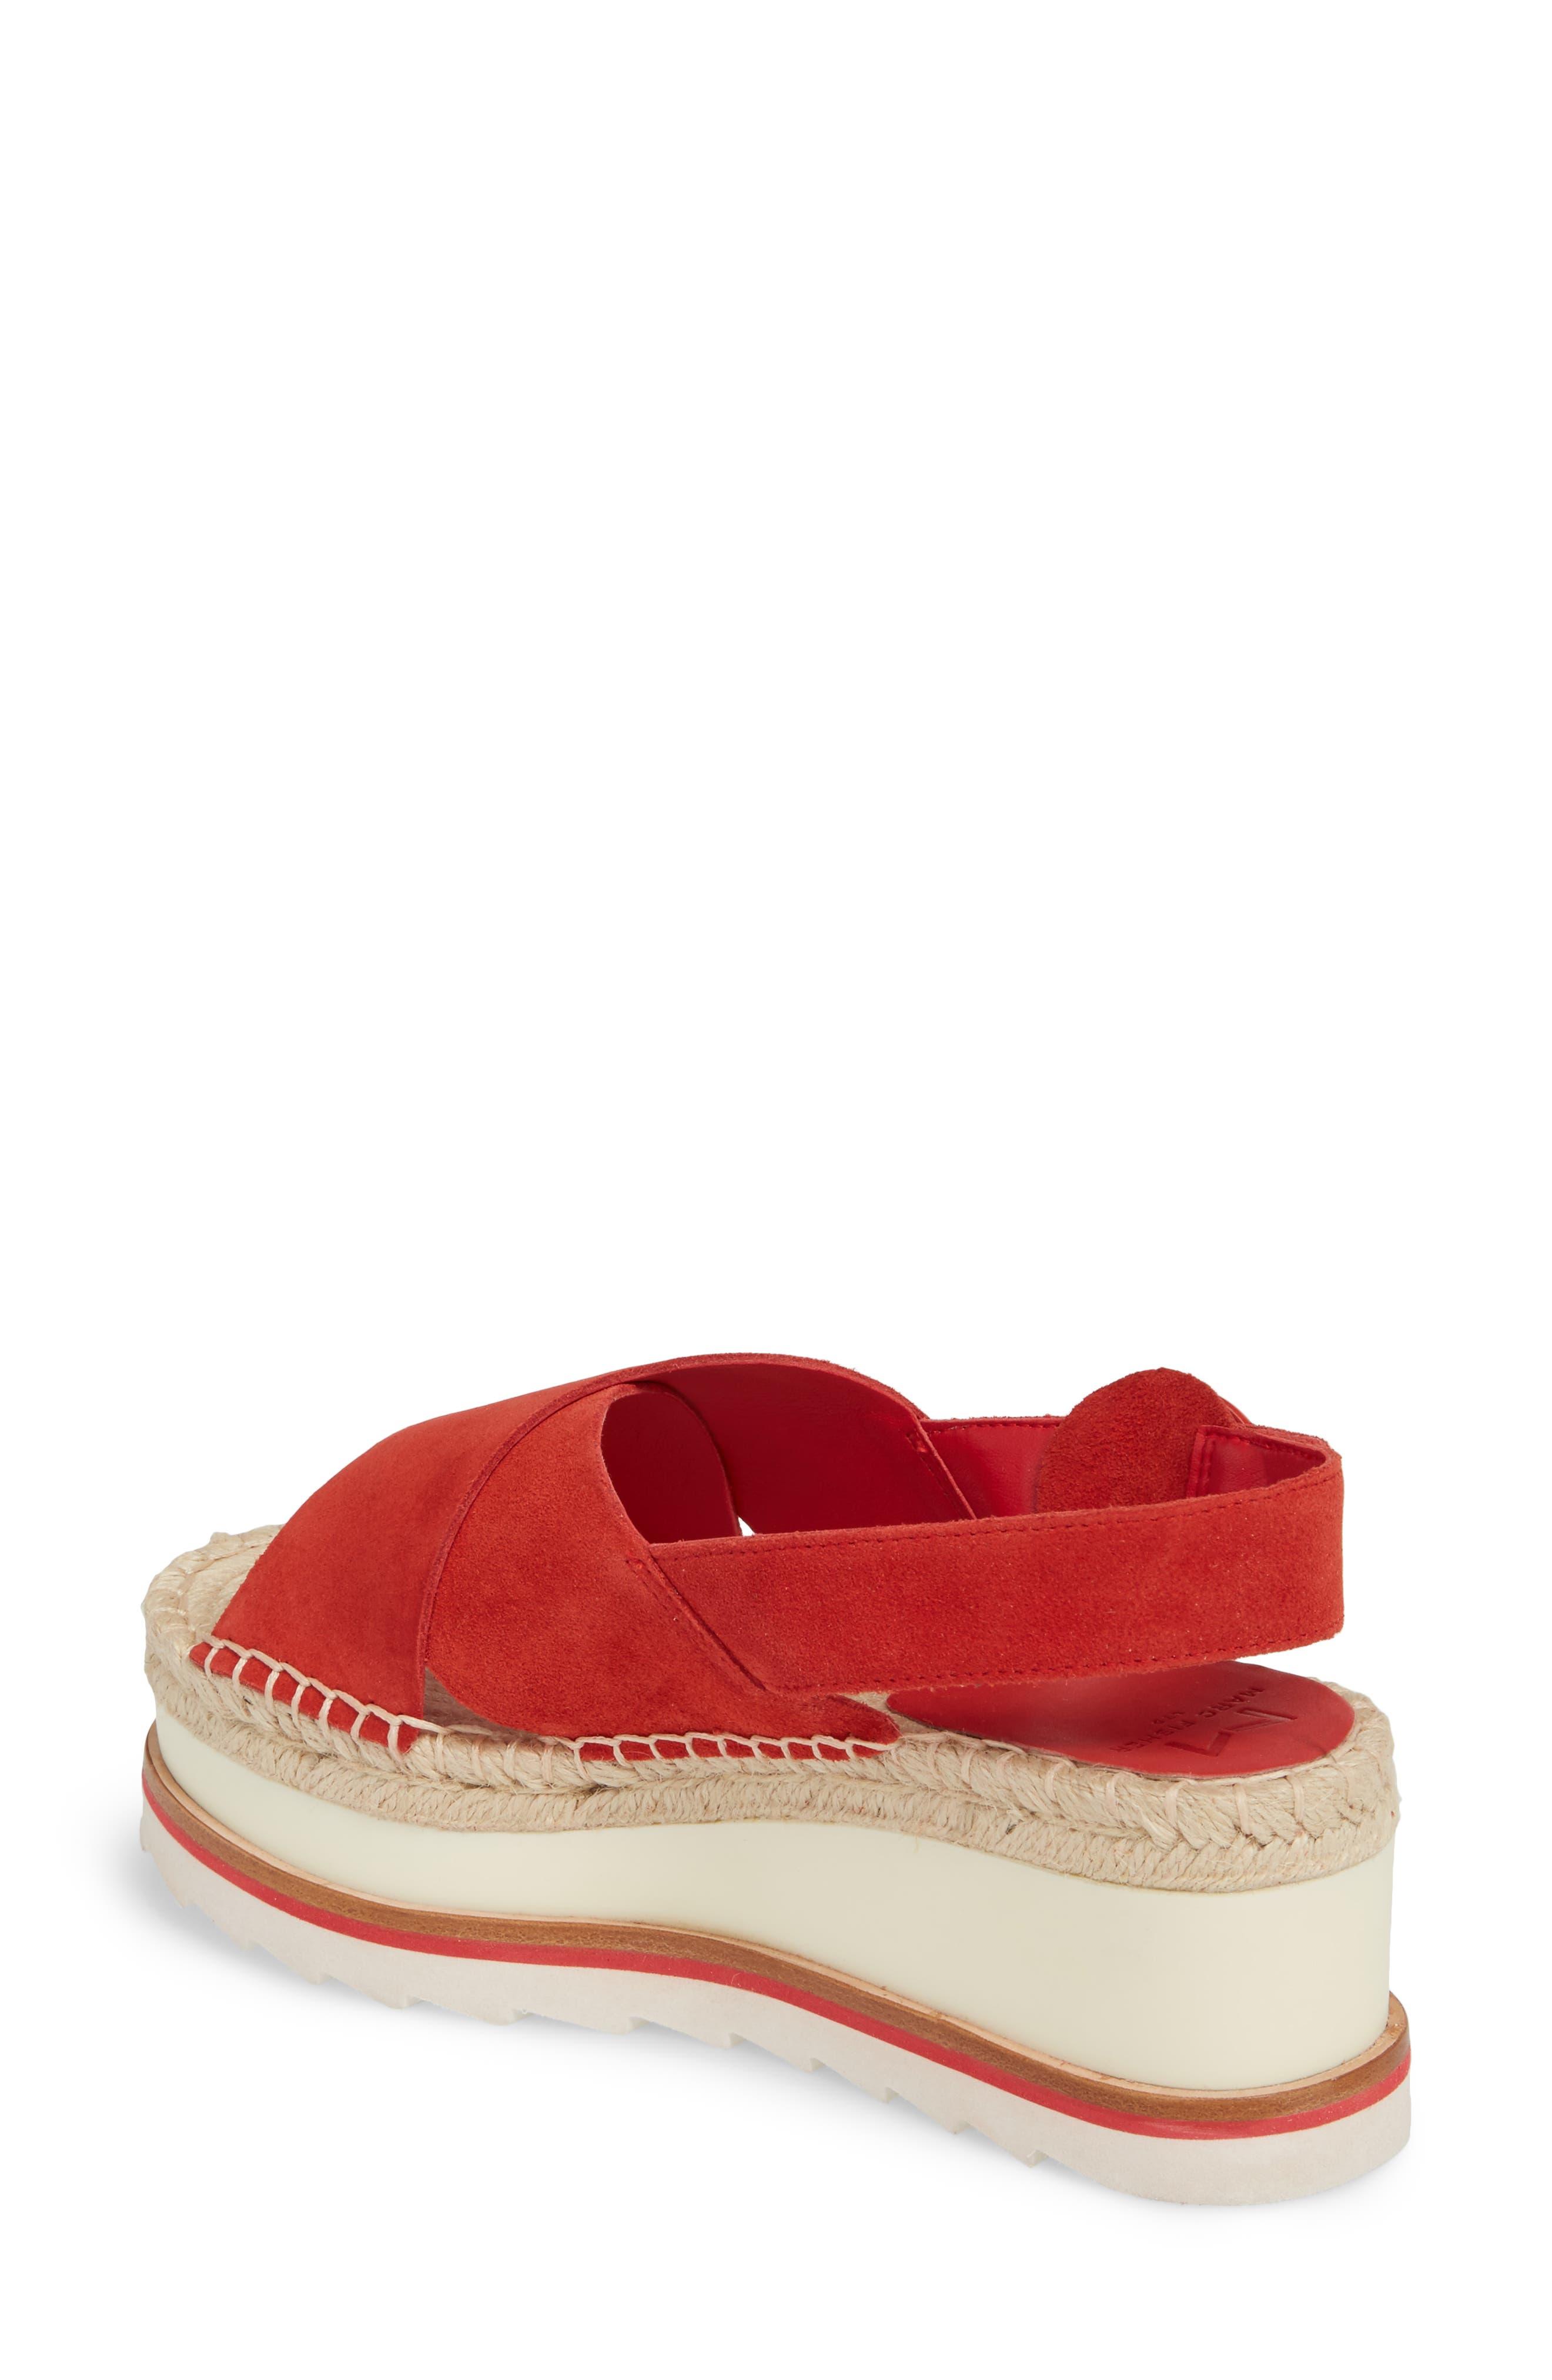 Glenna Platform Slingback Sandal,                             Alternate thumbnail 8, color,